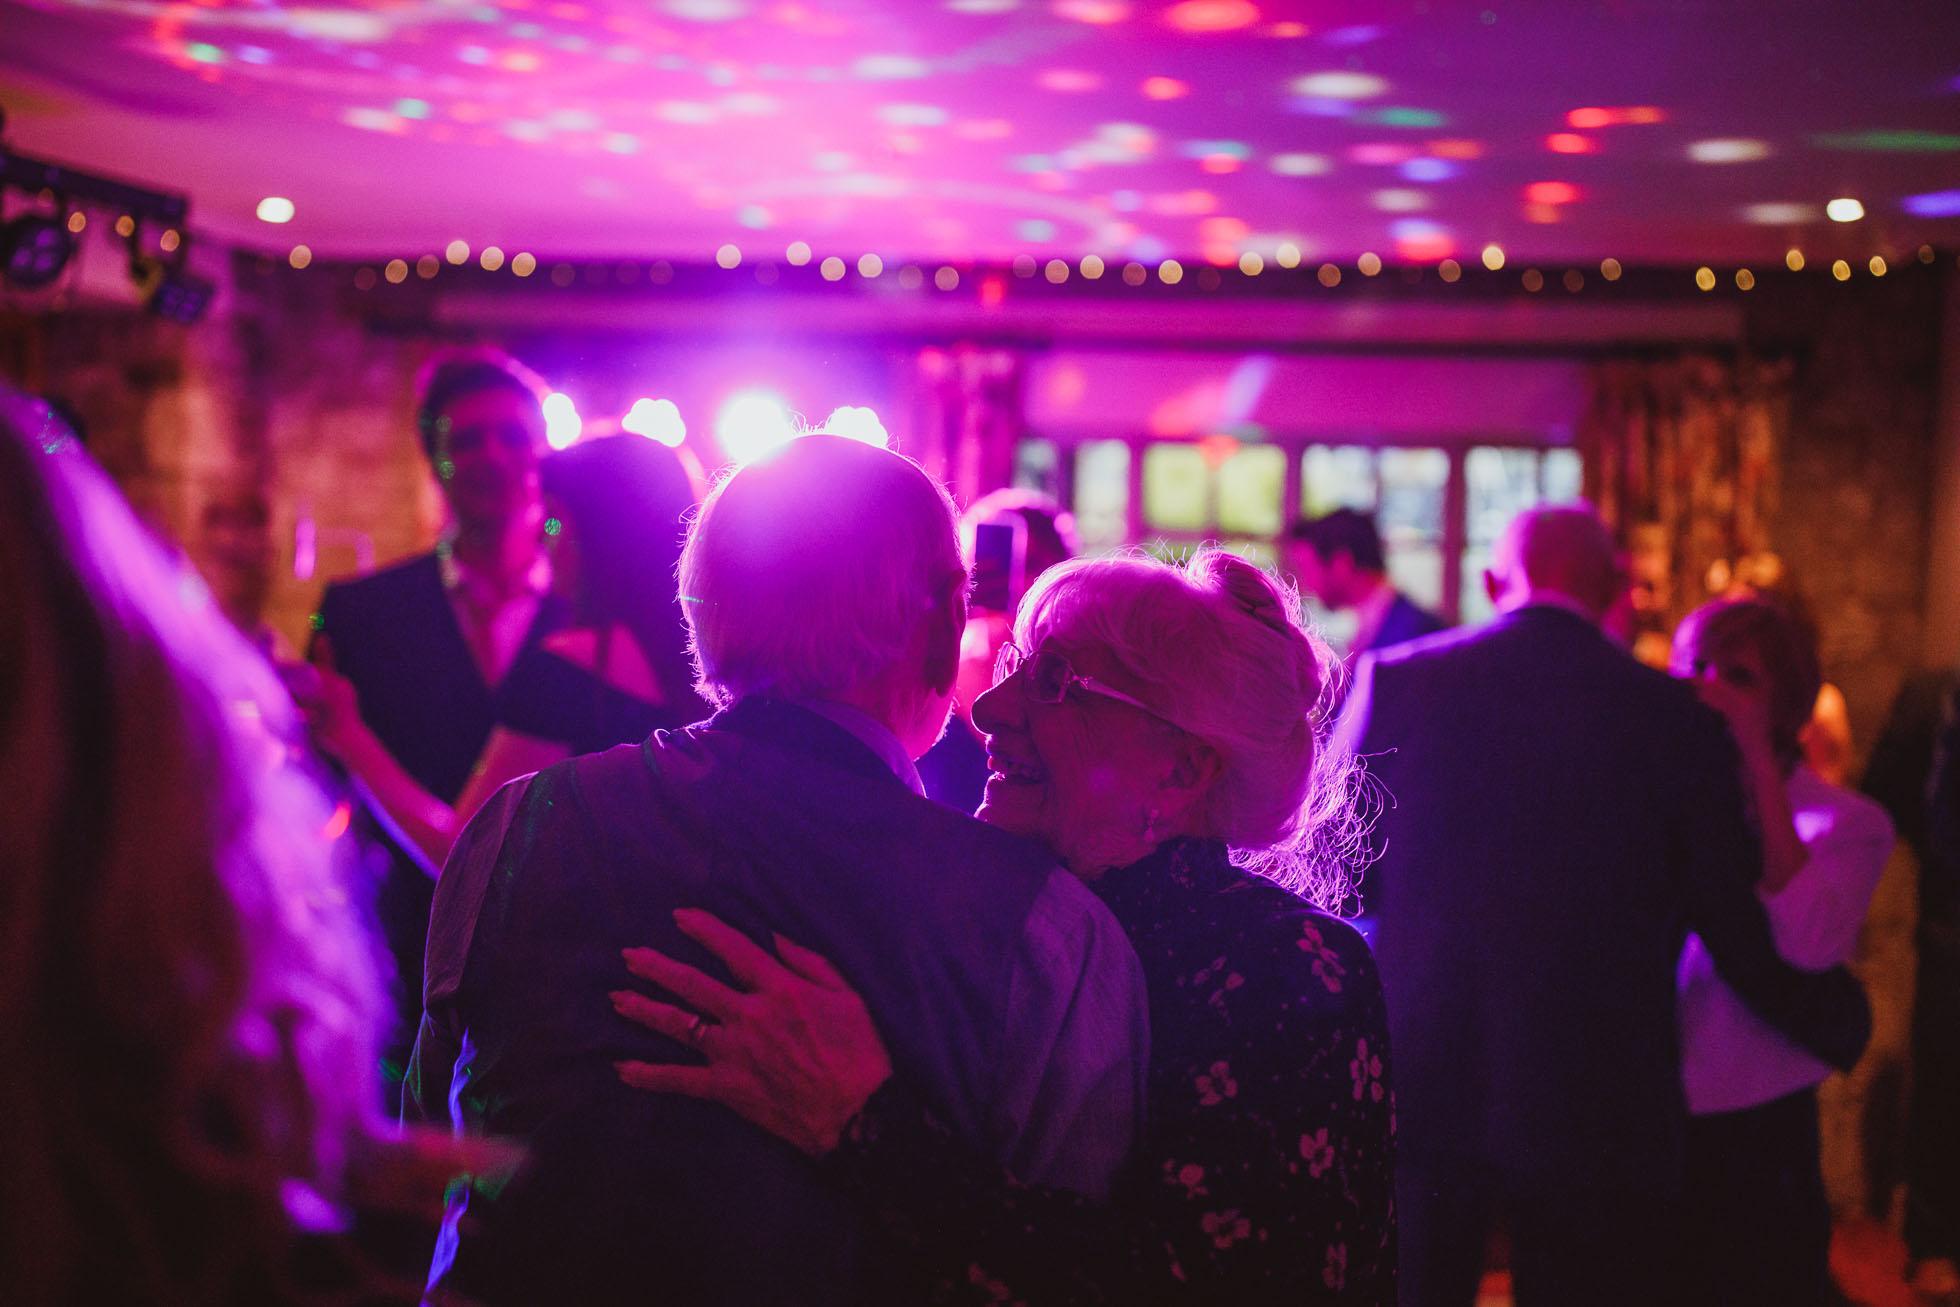 black_swan_helmsley_wedding_photographer-120.jpg